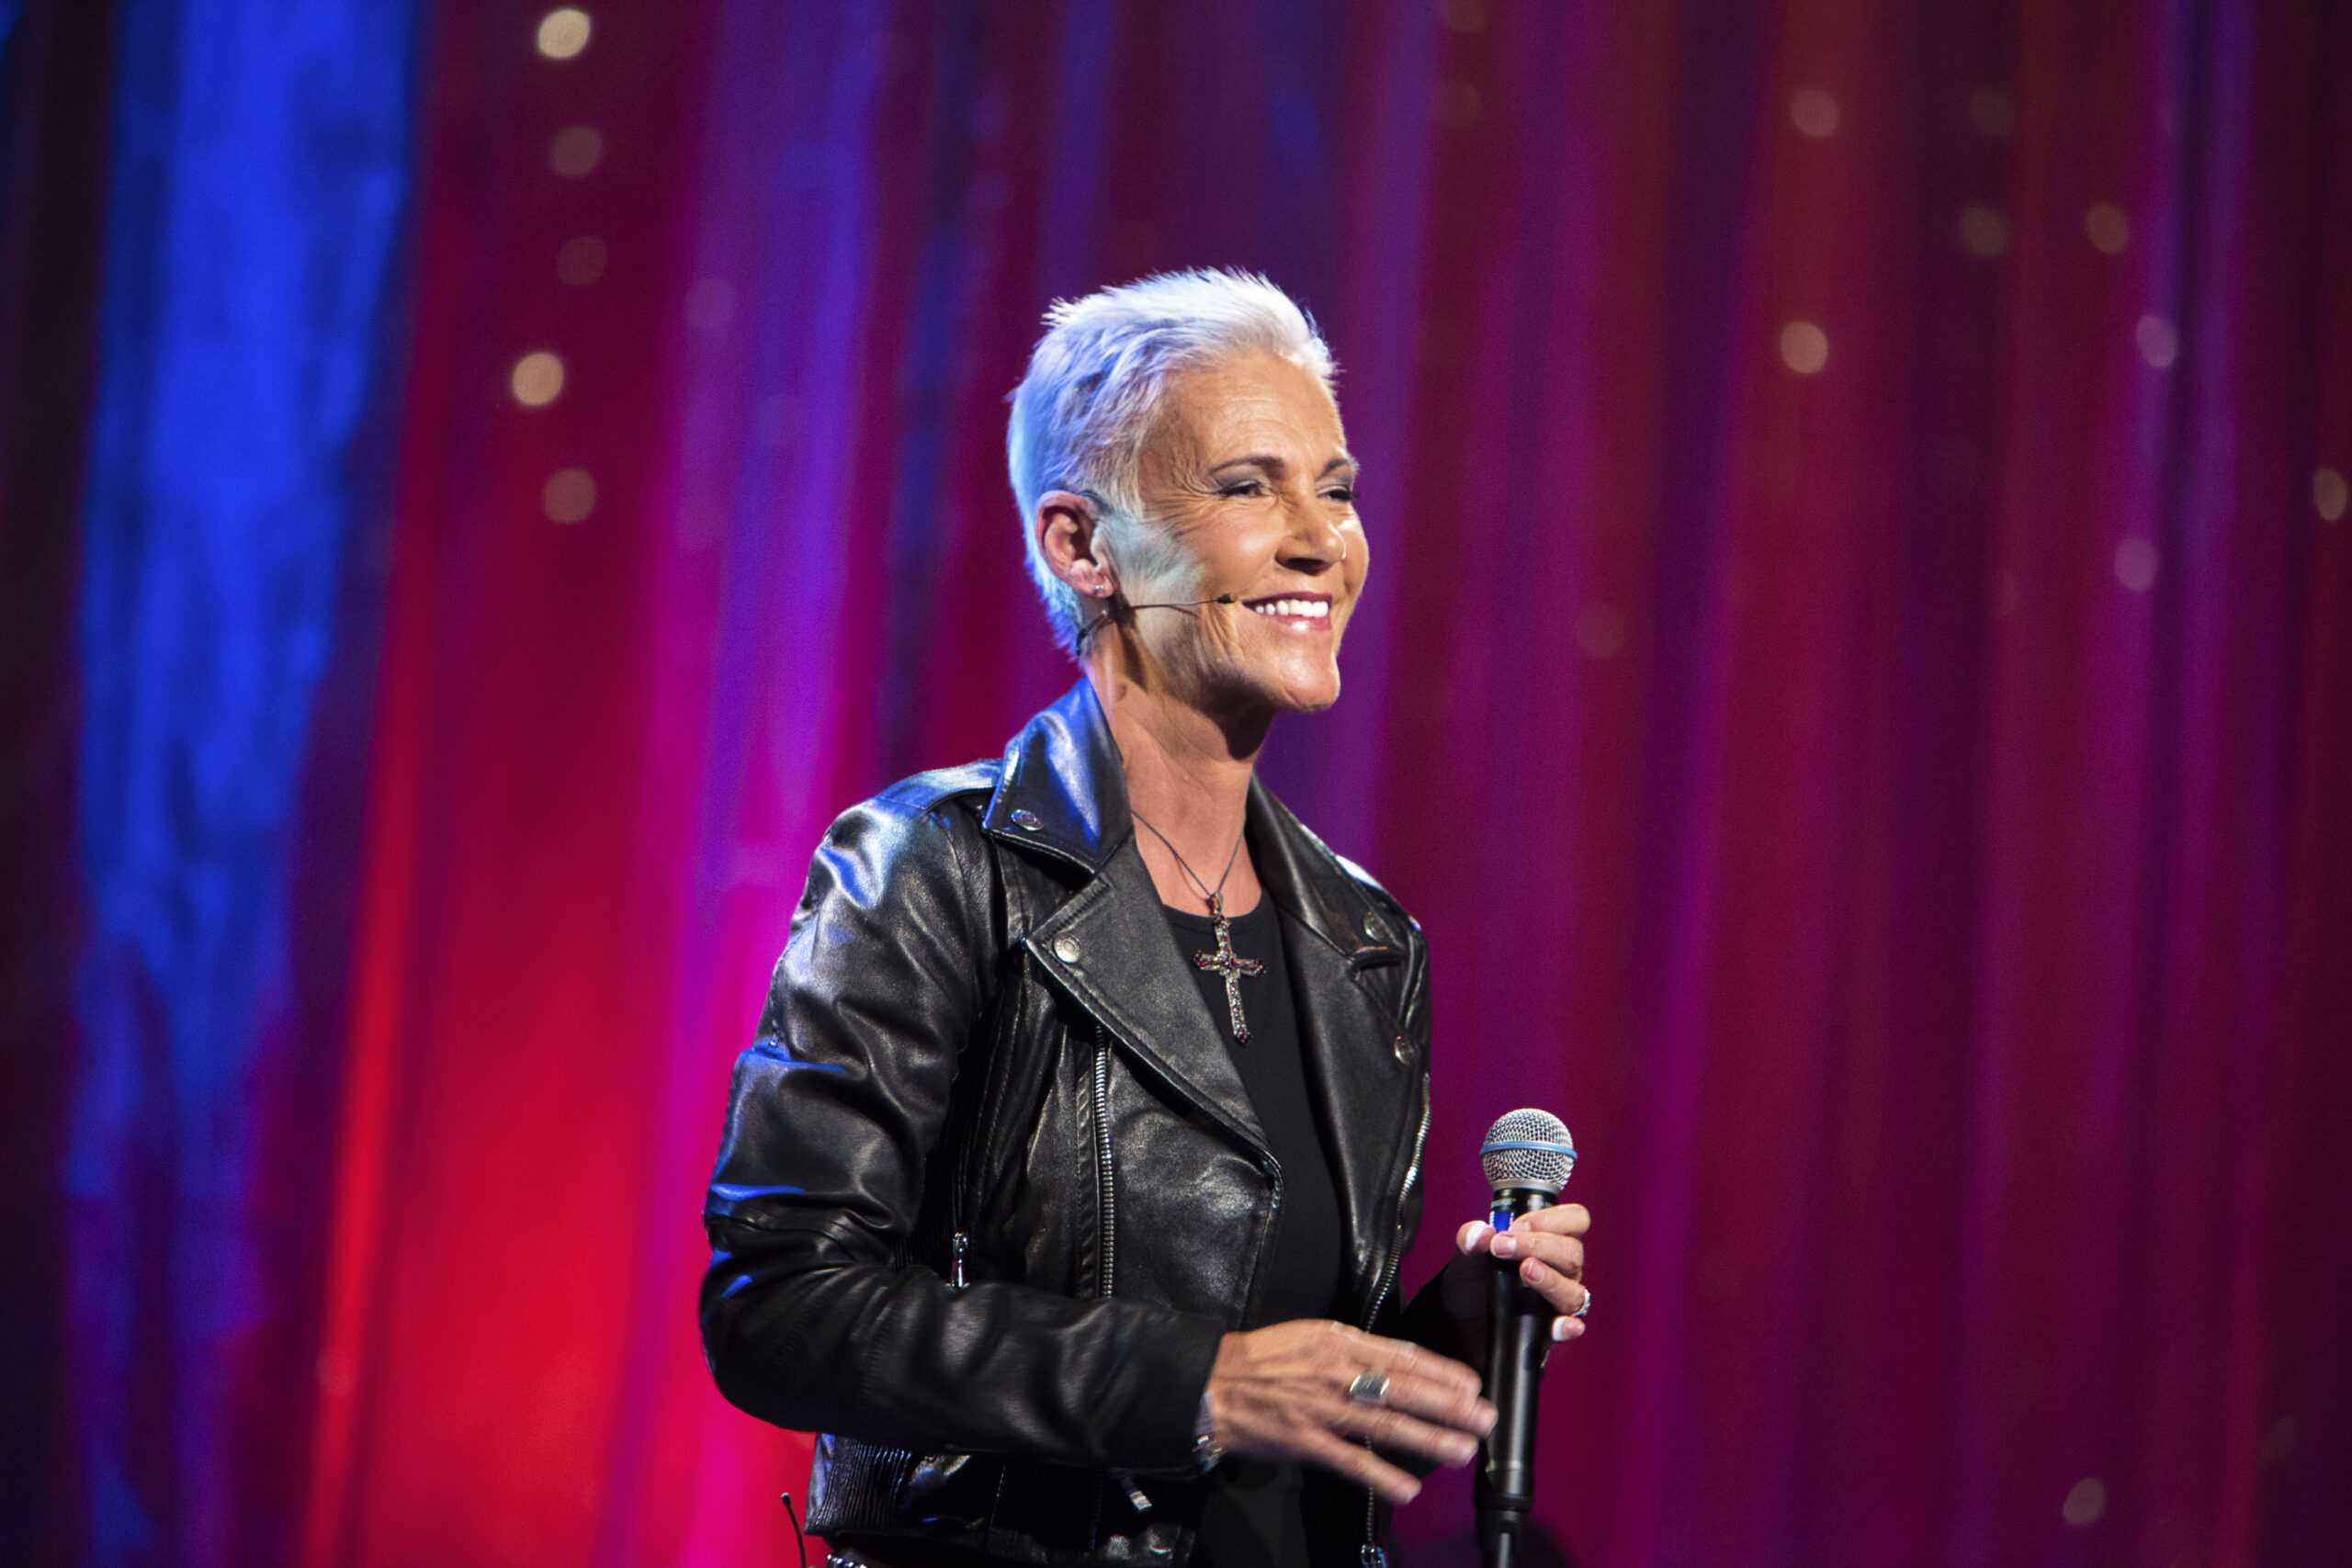 Sveriges artistelit hyllar Marie Fredriksson på Stora Teatern 1